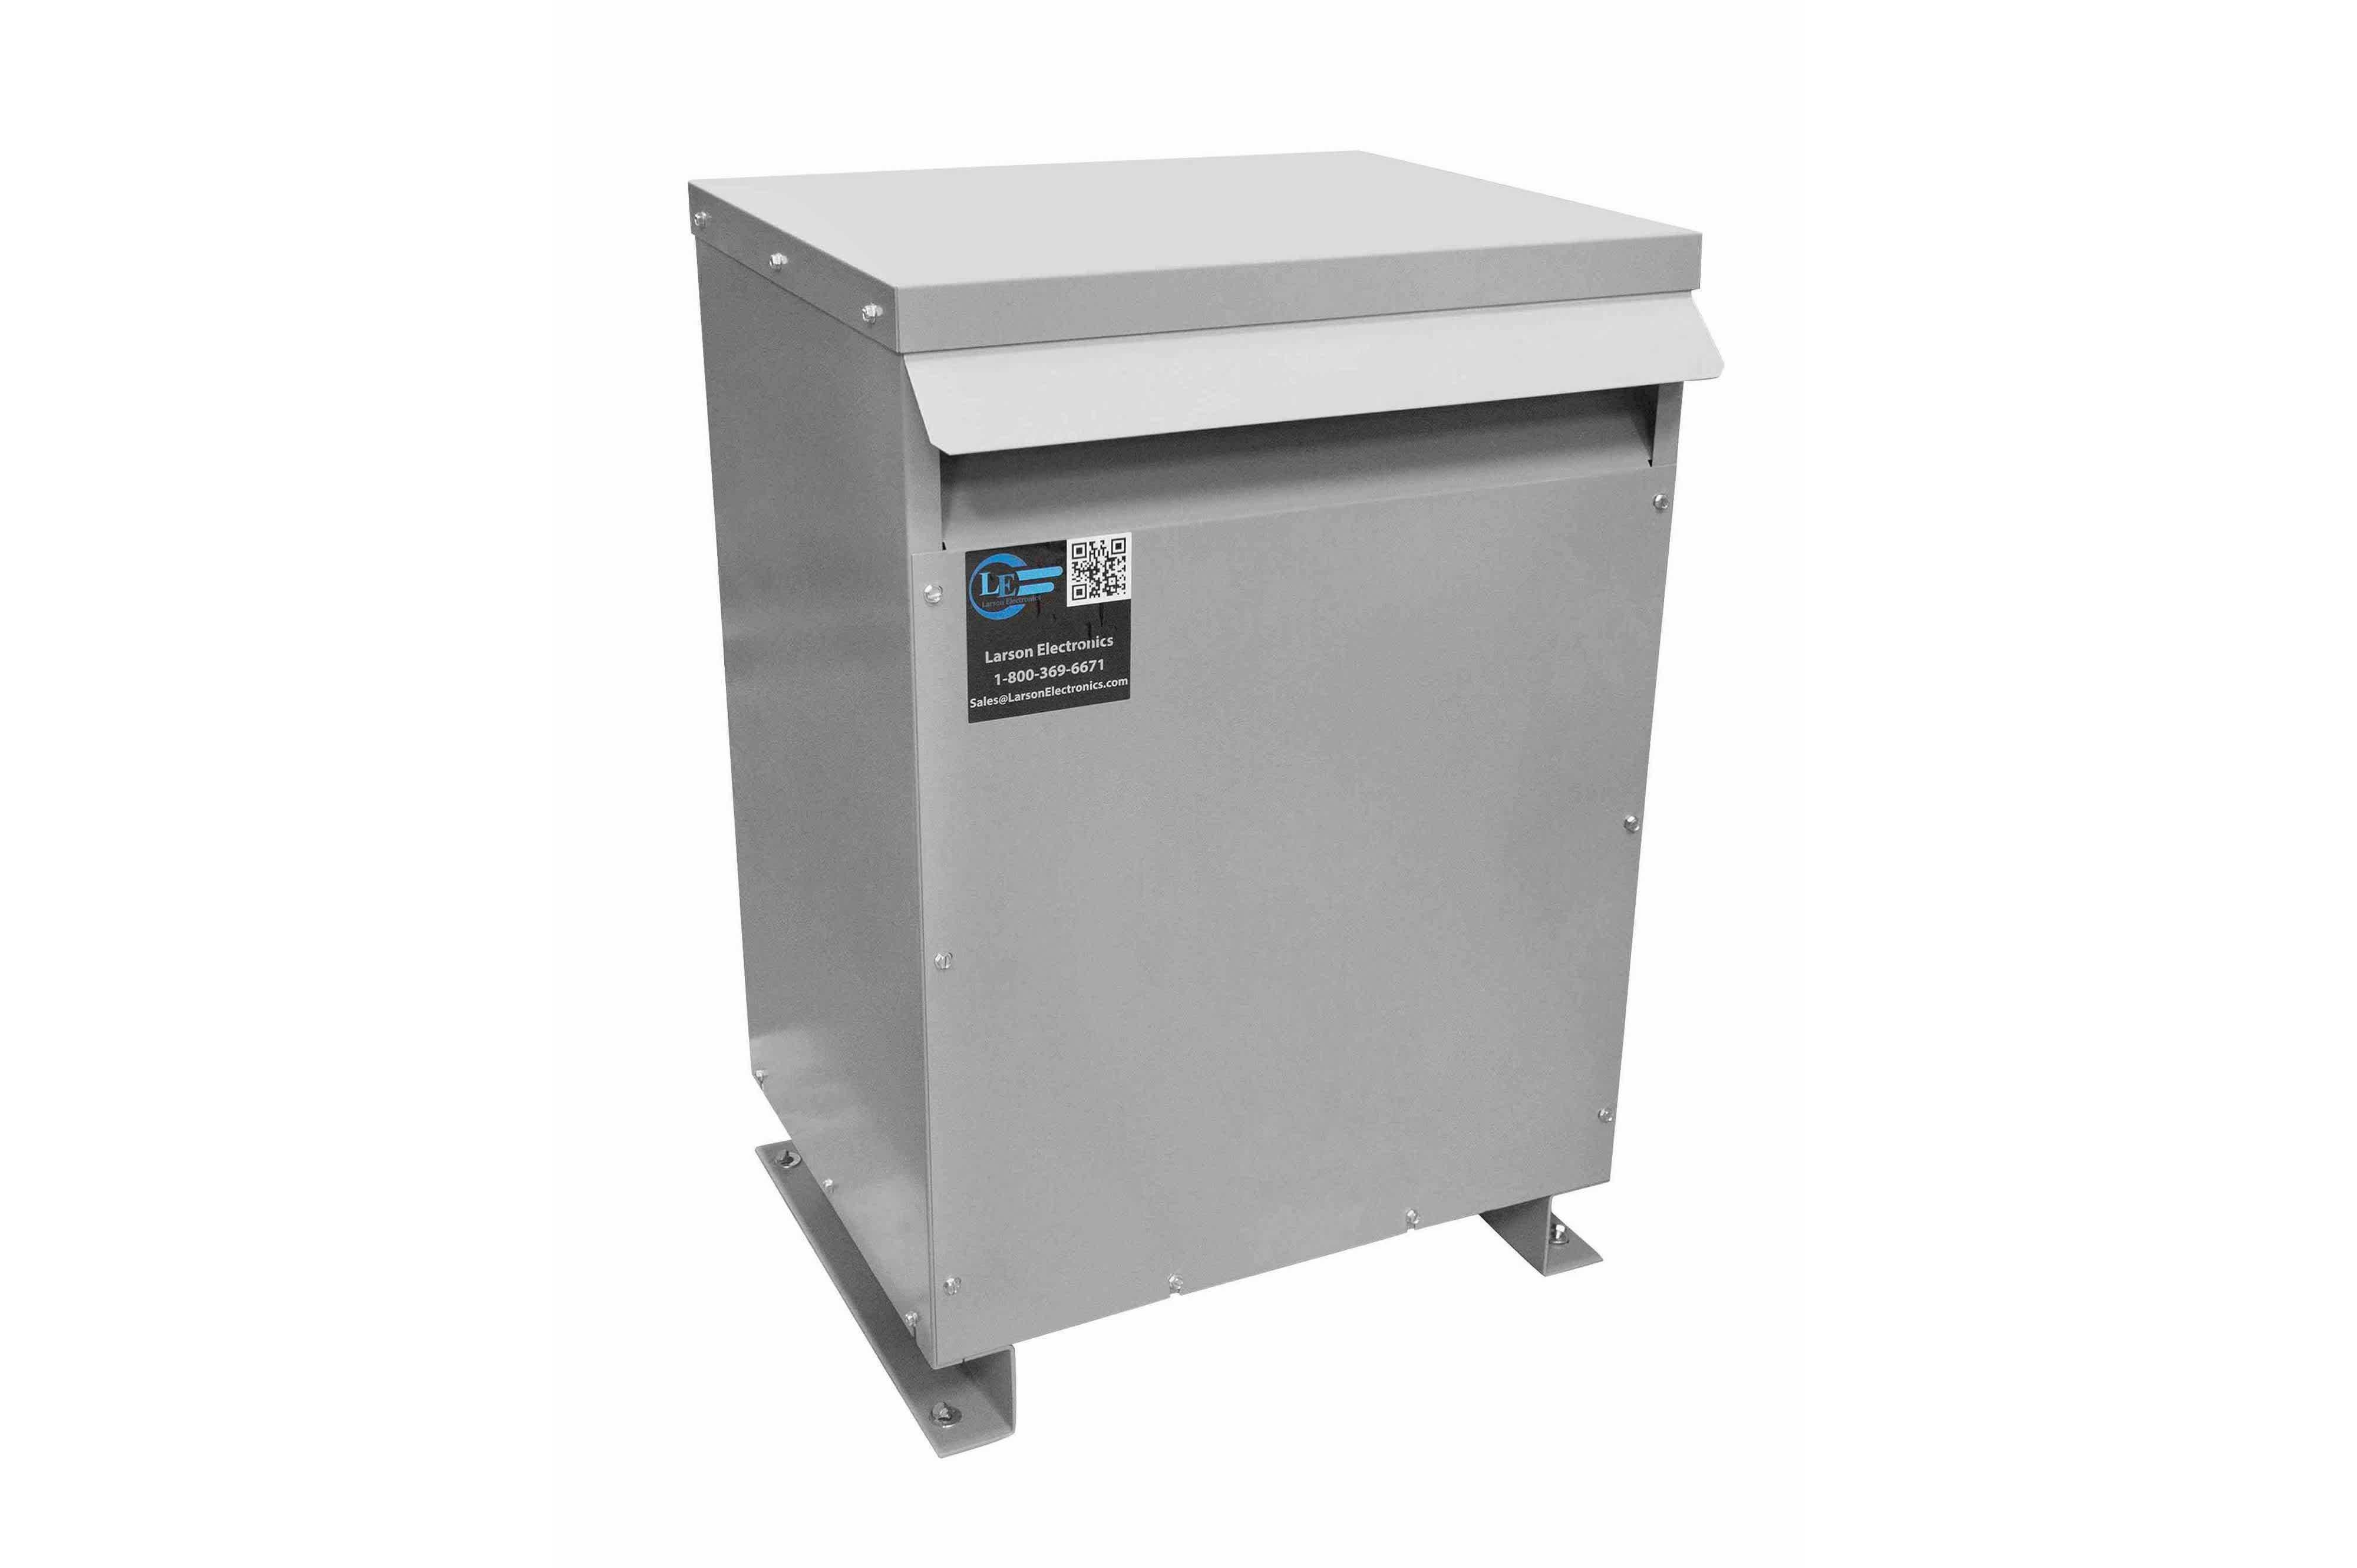 38 kVA 3PH Isolation Transformer, 600V Wye Primary, 480V Delta Secondary, N3R, Ventilated, 60 Hz